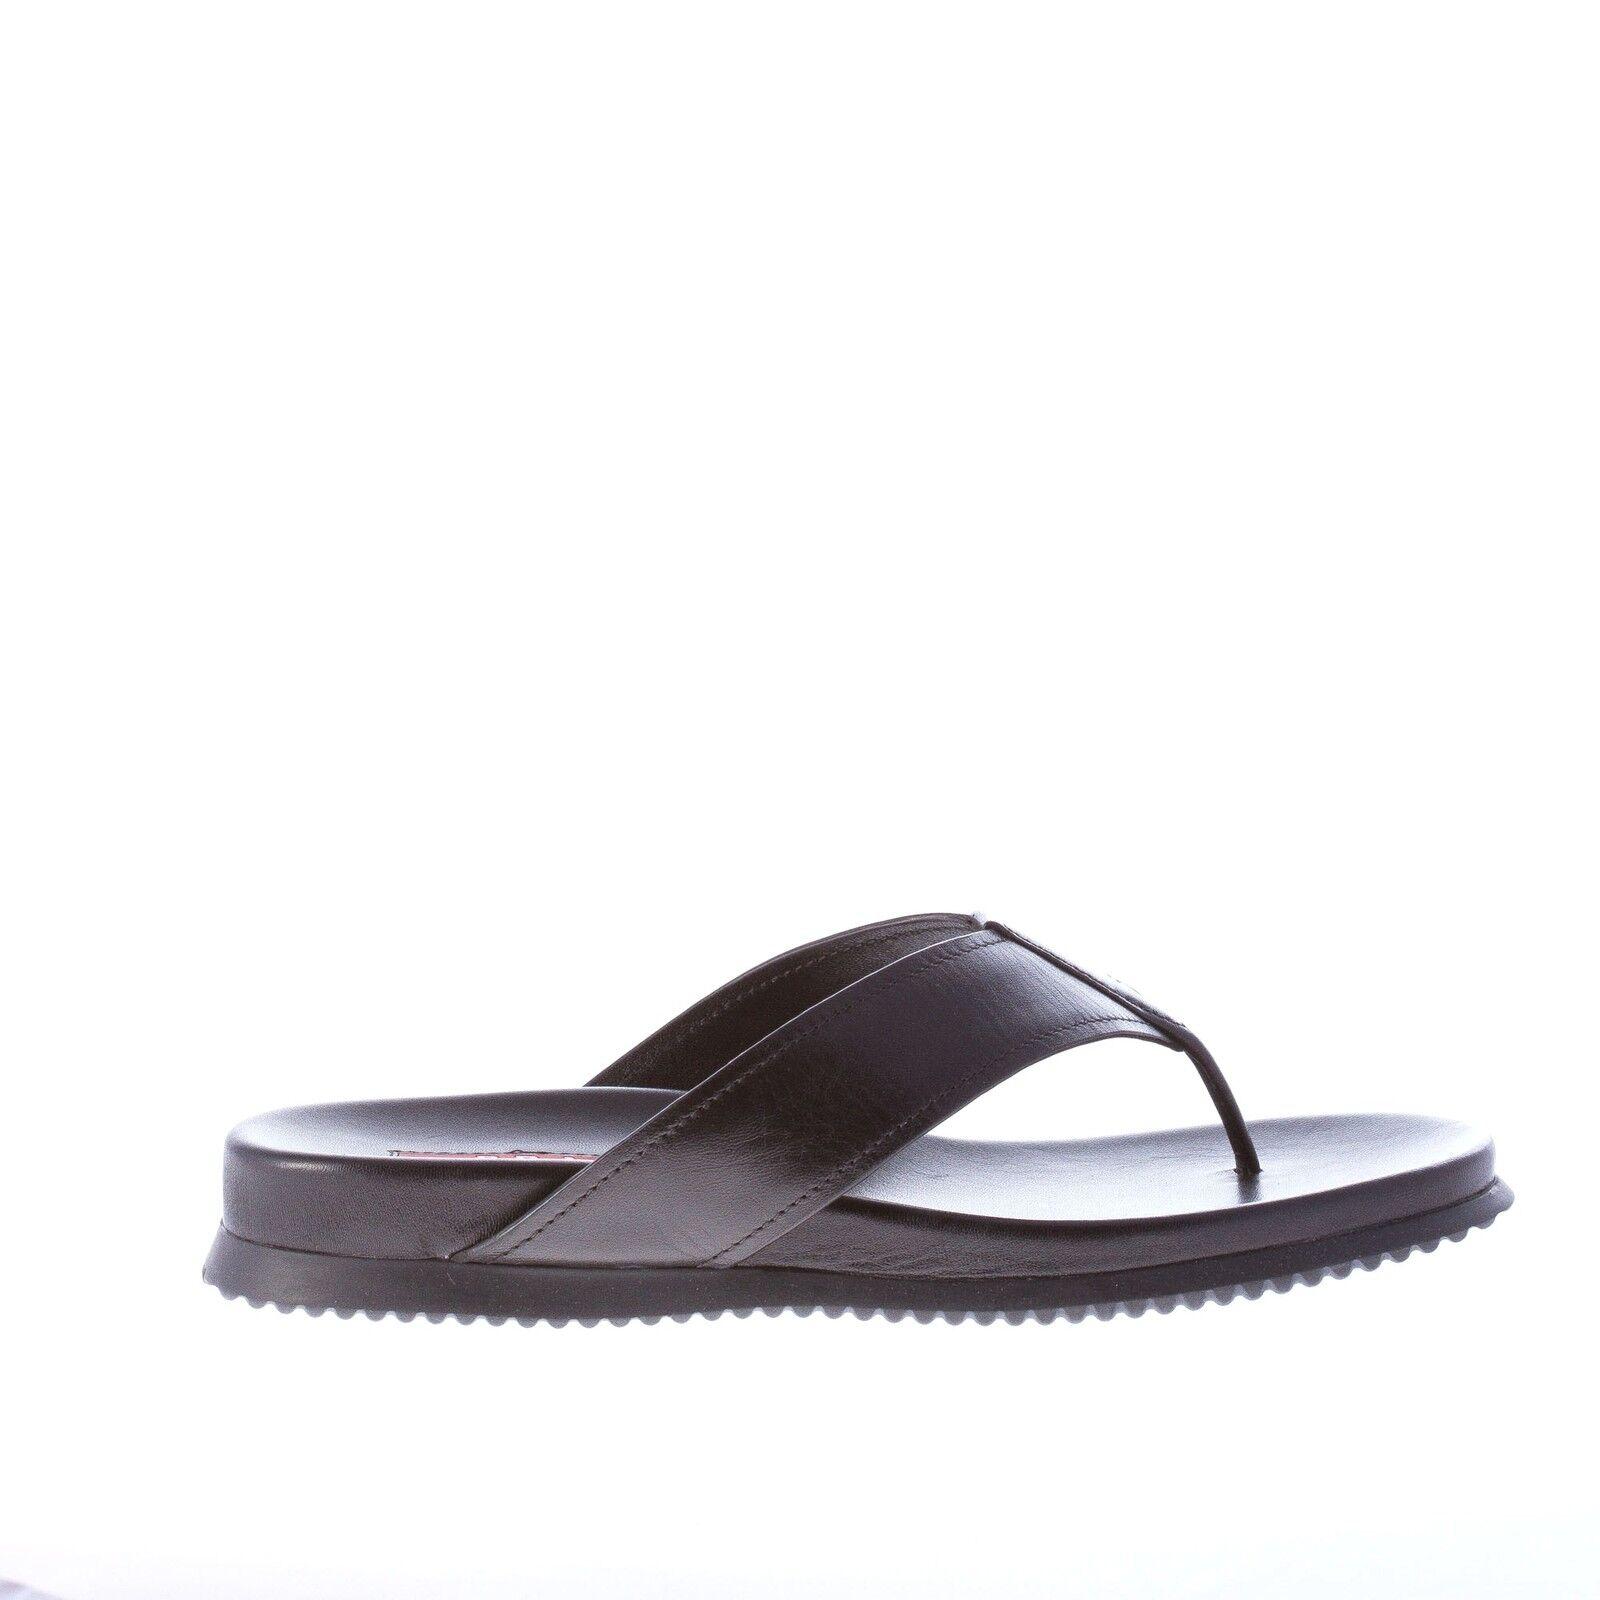 Prada Zapatos señora mujer zapatos negro Leather Thong slide Sandal